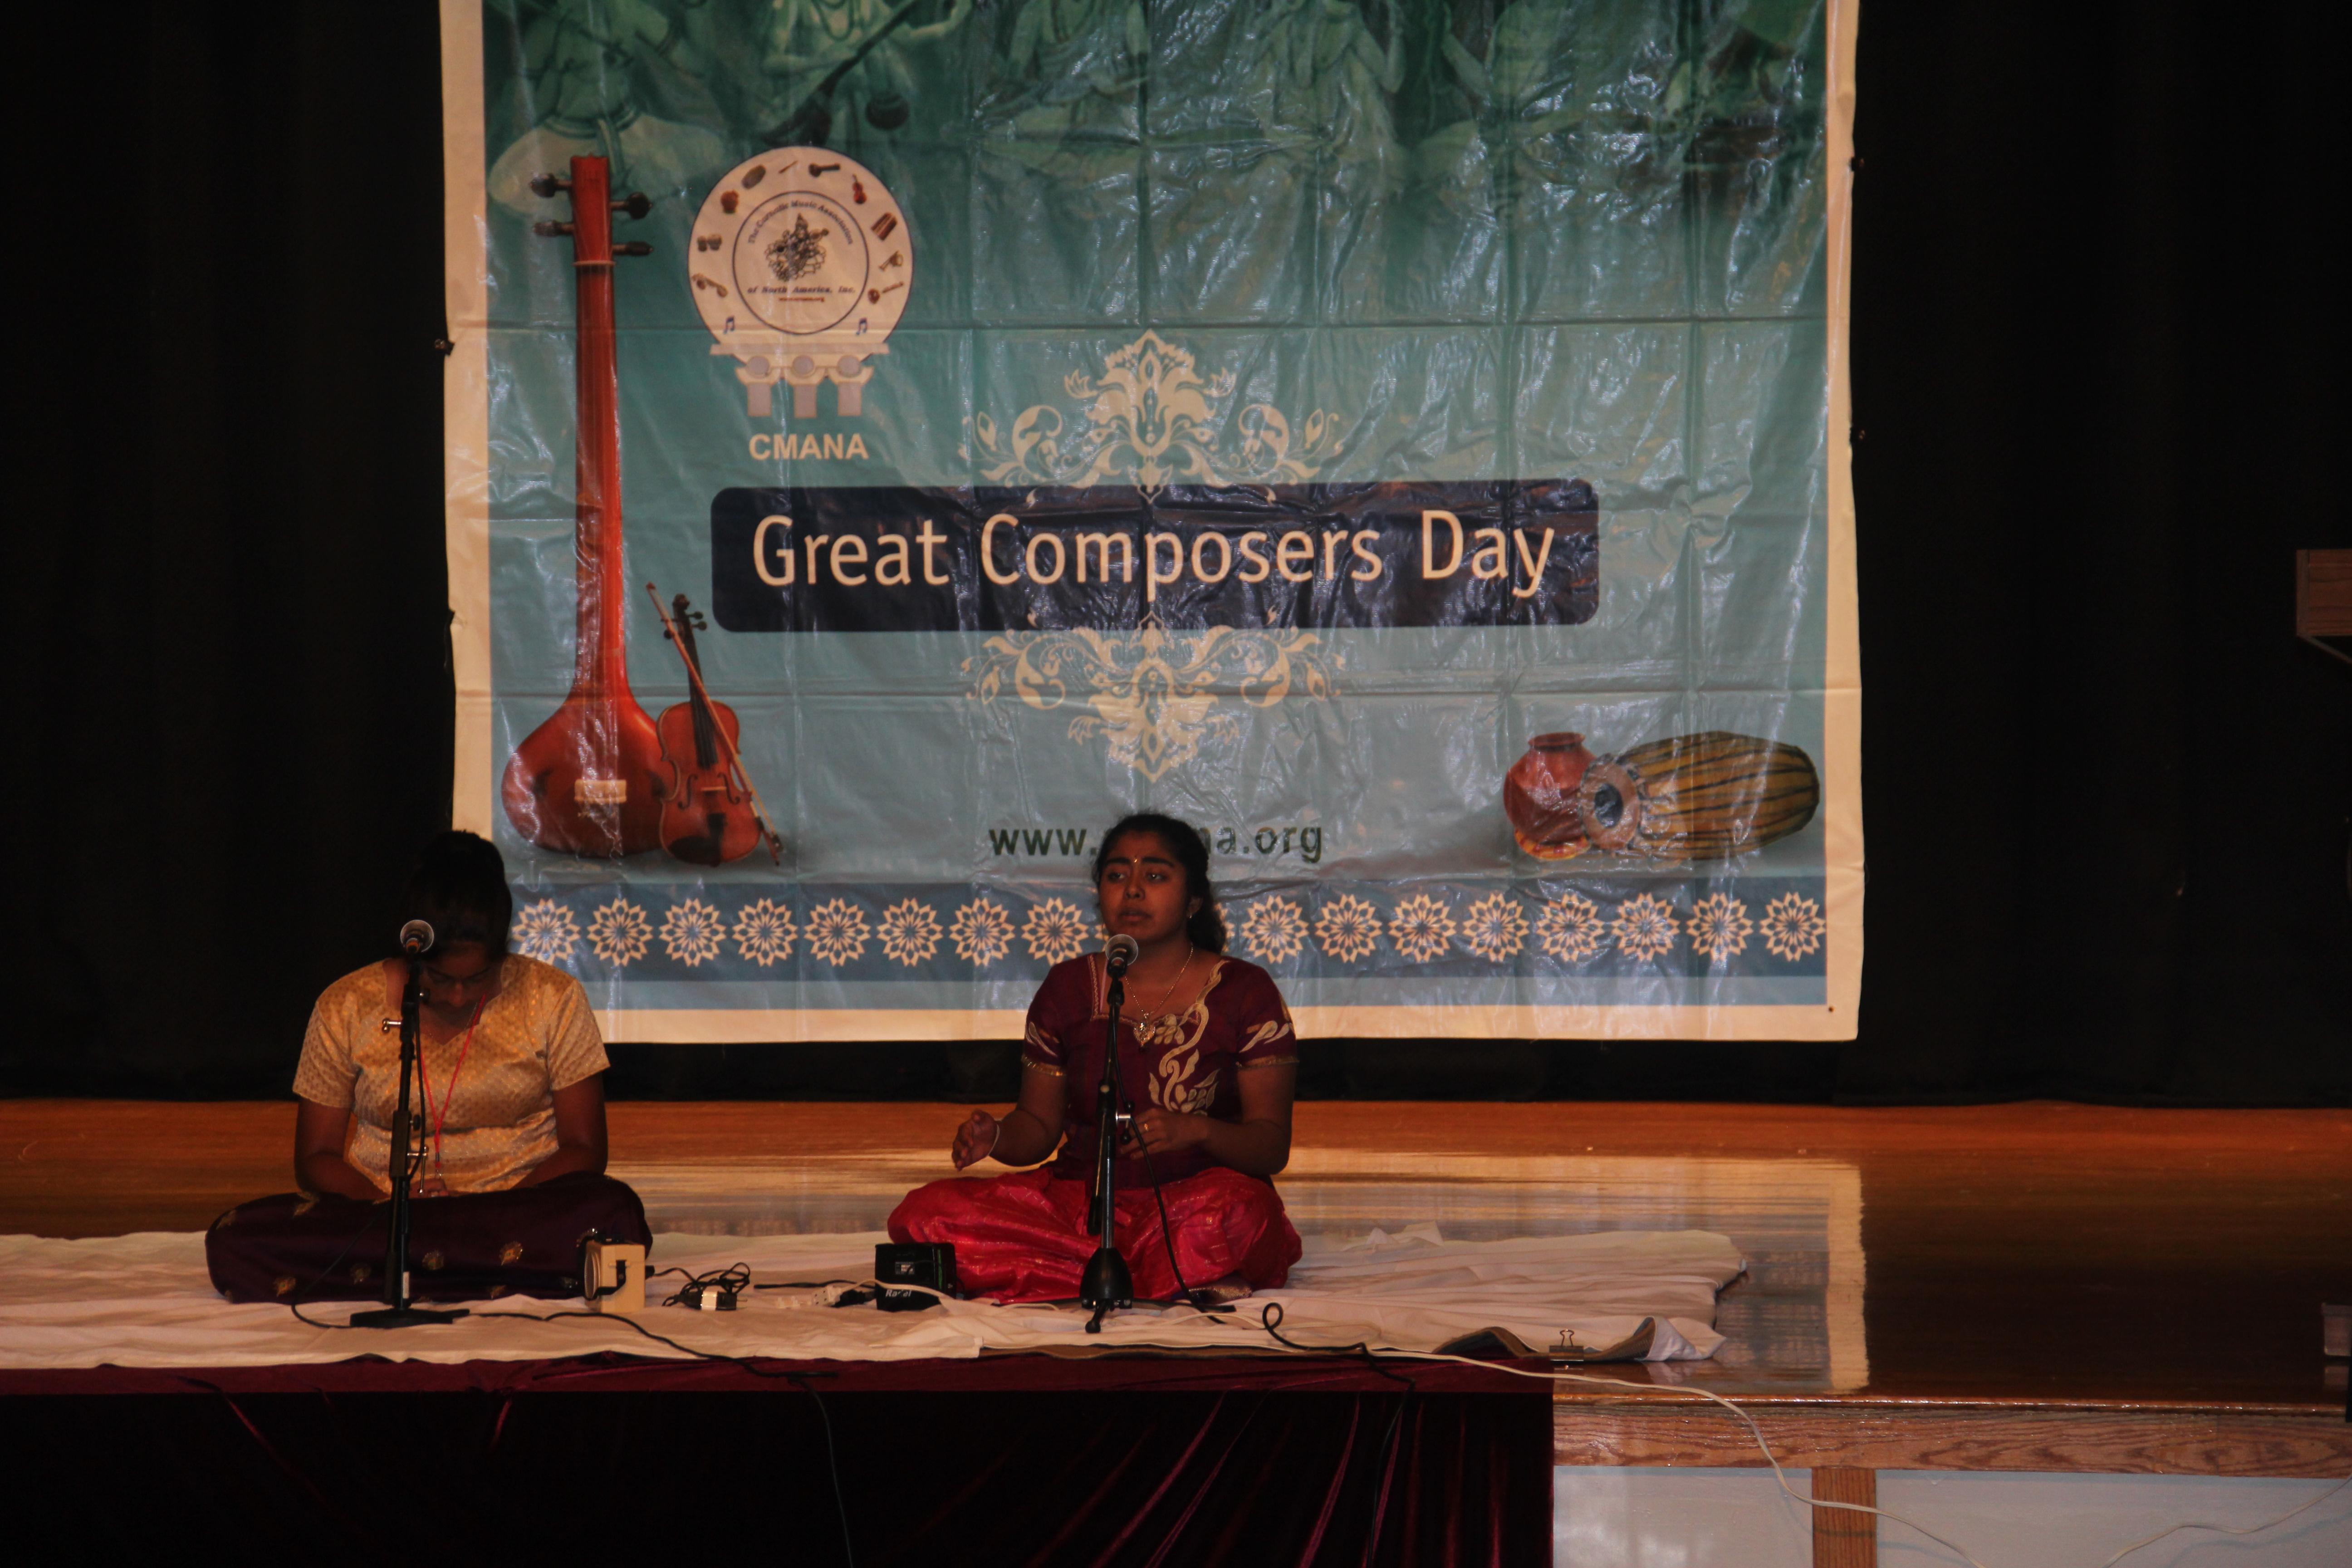 Carnatic Music Association of North America